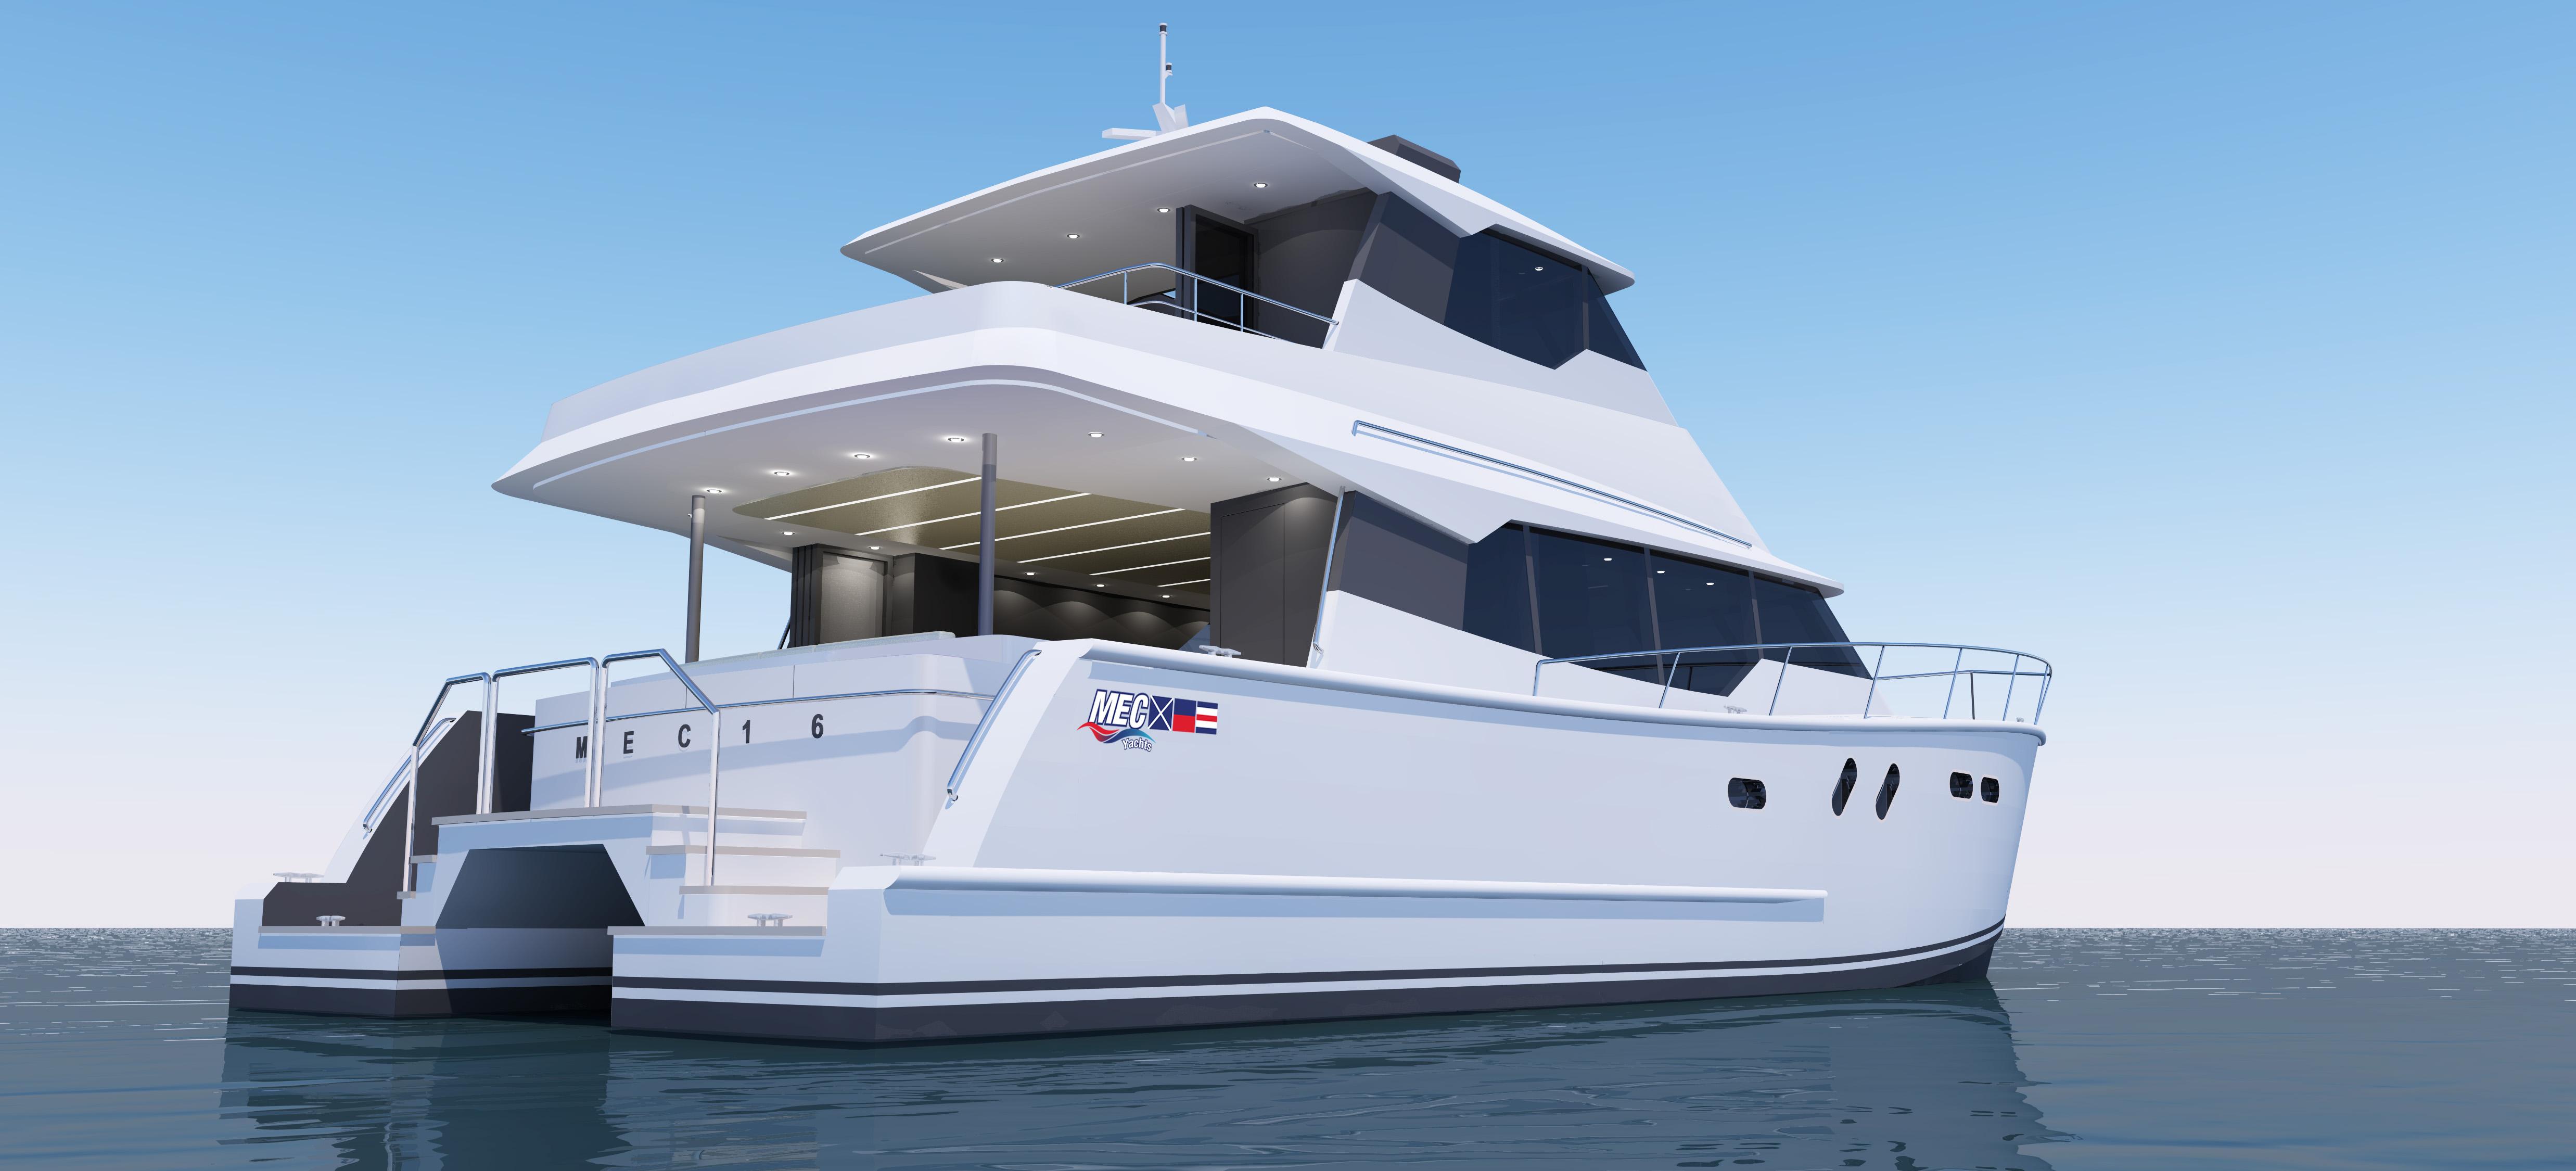 16.75m Starboard Quarter Approach